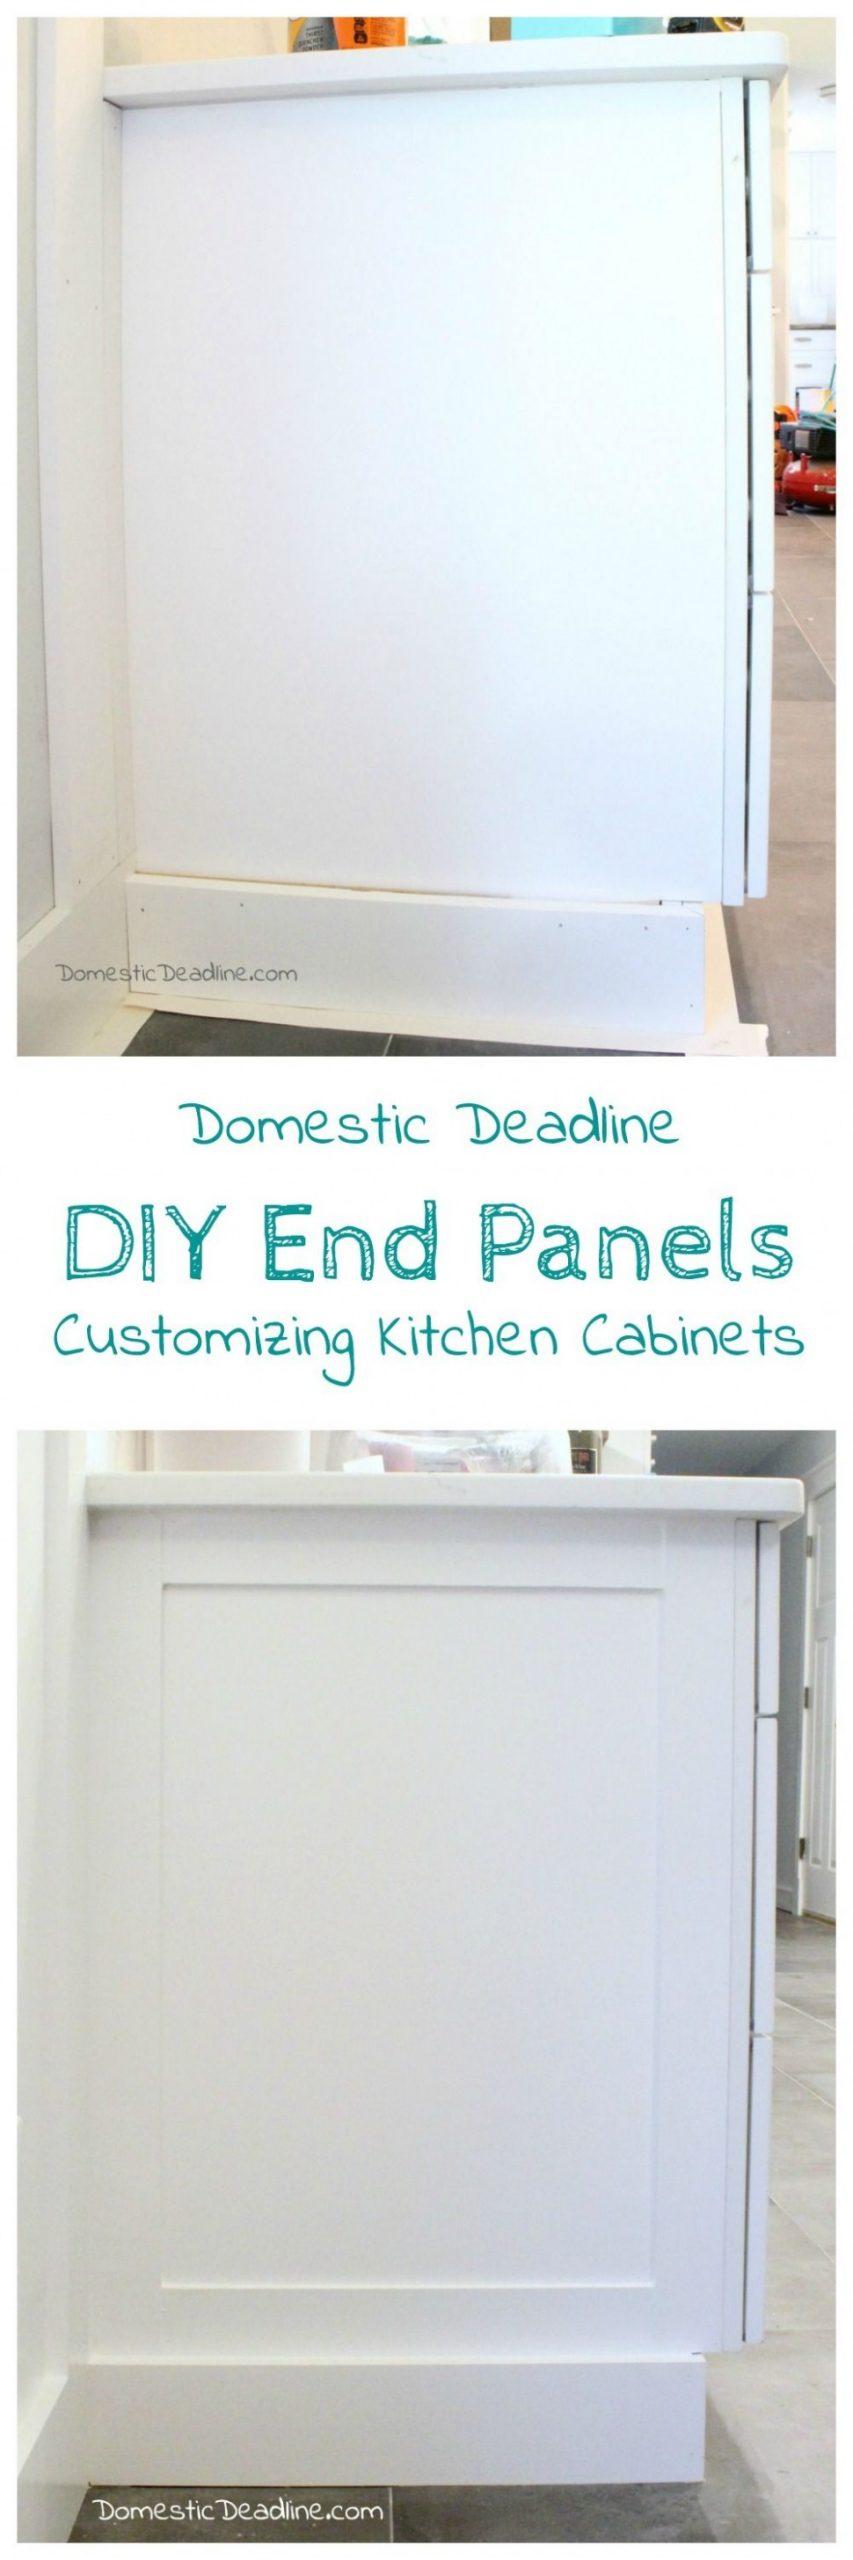 DIY Cabinet End Panels  Domestic Deadline  Kitchen units decor  - Kitchen Cabinet Decorative End Panels